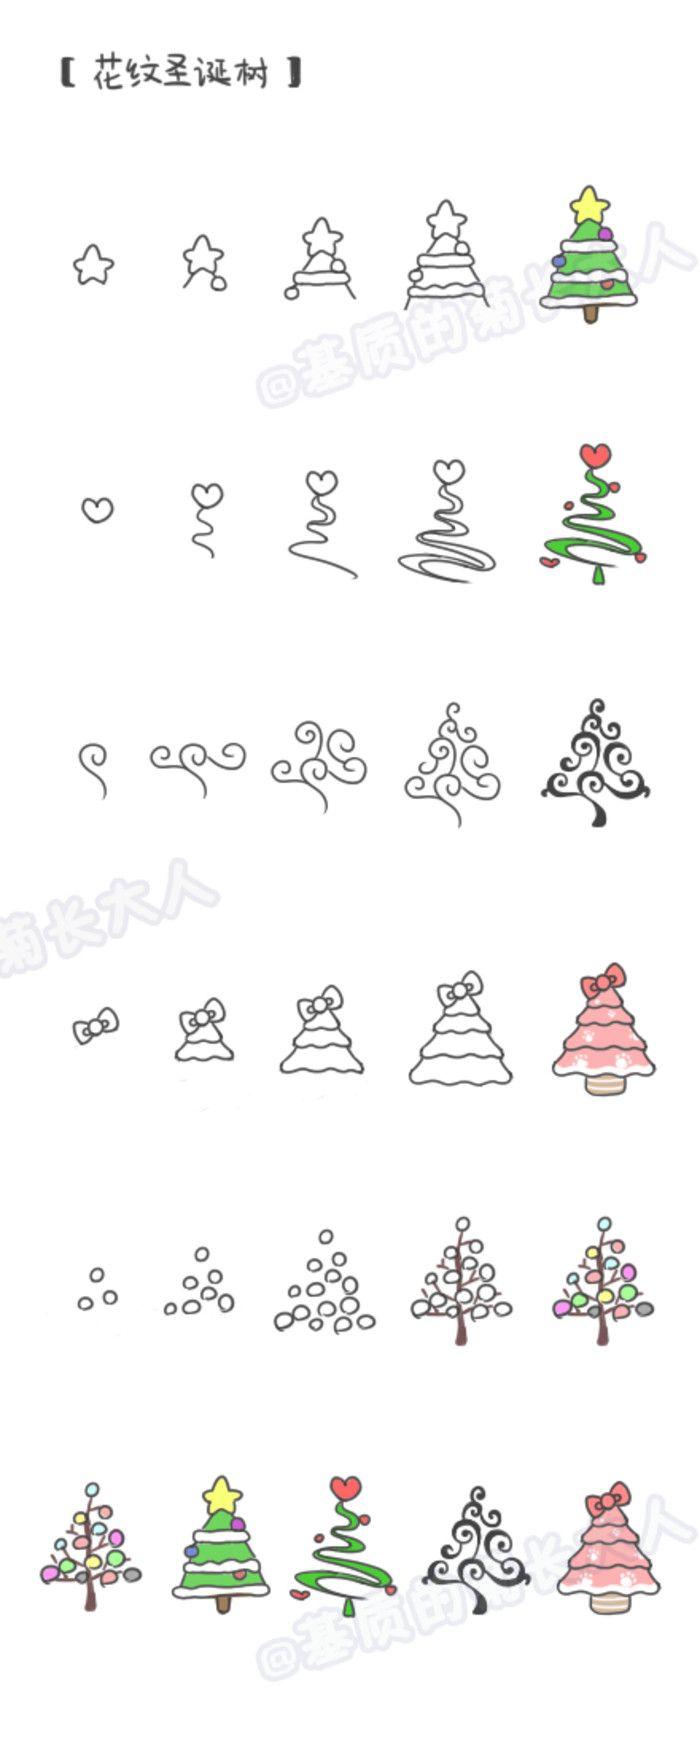 Pin van Meg Prybella op christmas crafts   Pinterest - Tekenen ...